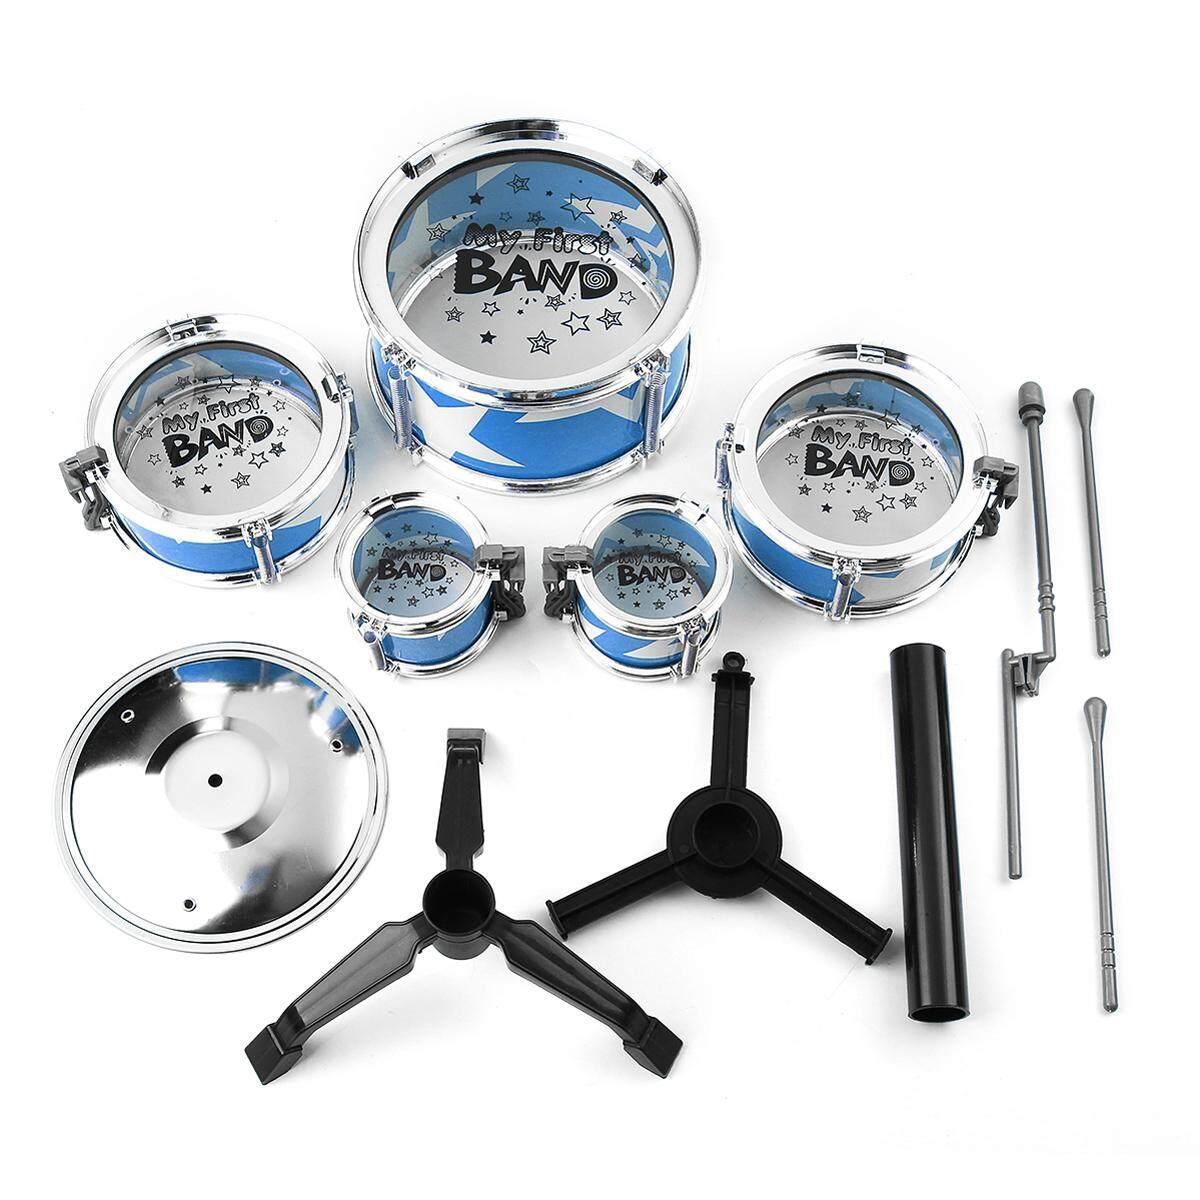 Mini Jazz Drum DIY Perkusi Alat Musik Anak-anak Fun Mainan Hadiah untuk Anak-anak Biru-Internasional